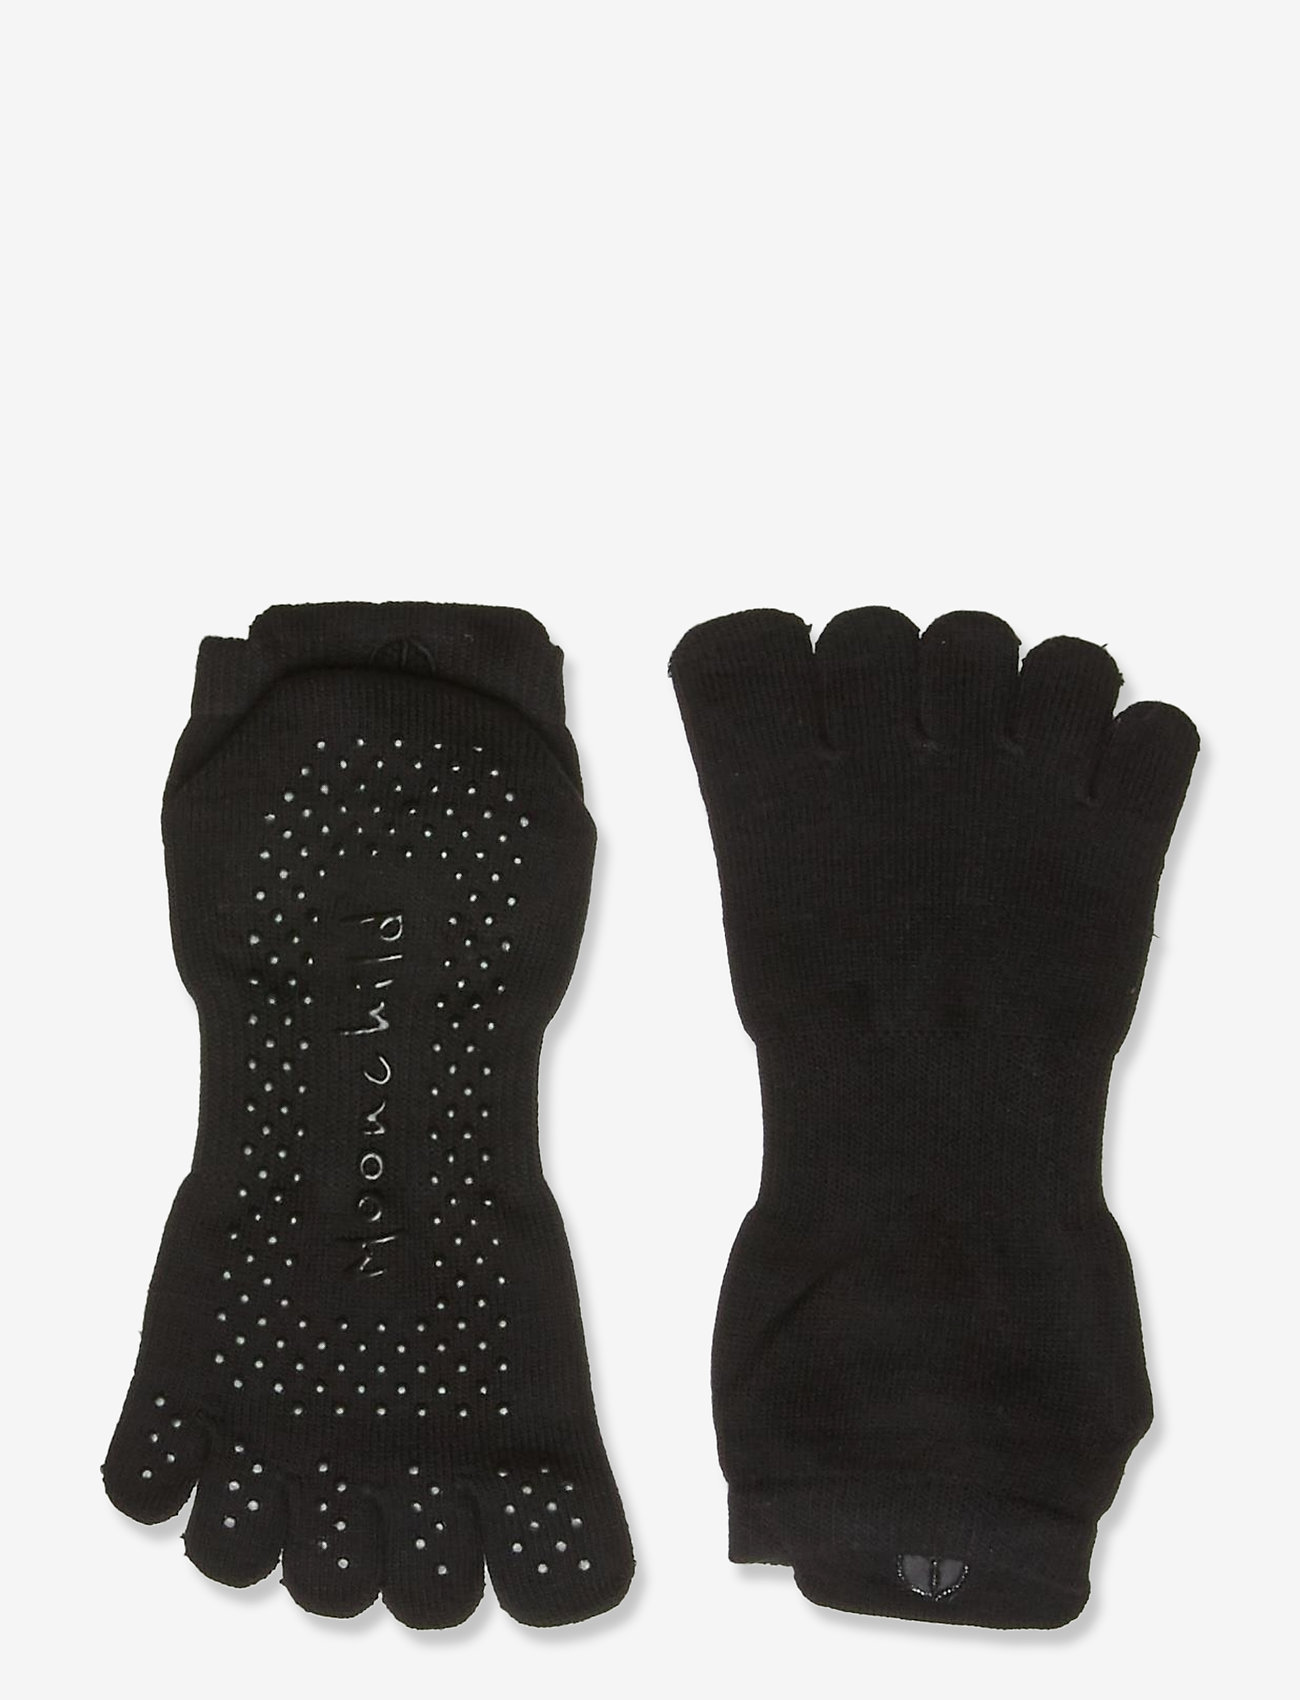 Moonchild Yoga Wear - Moonchild Grip Socks - Low Rise - yoga-socken - onyx black - 1